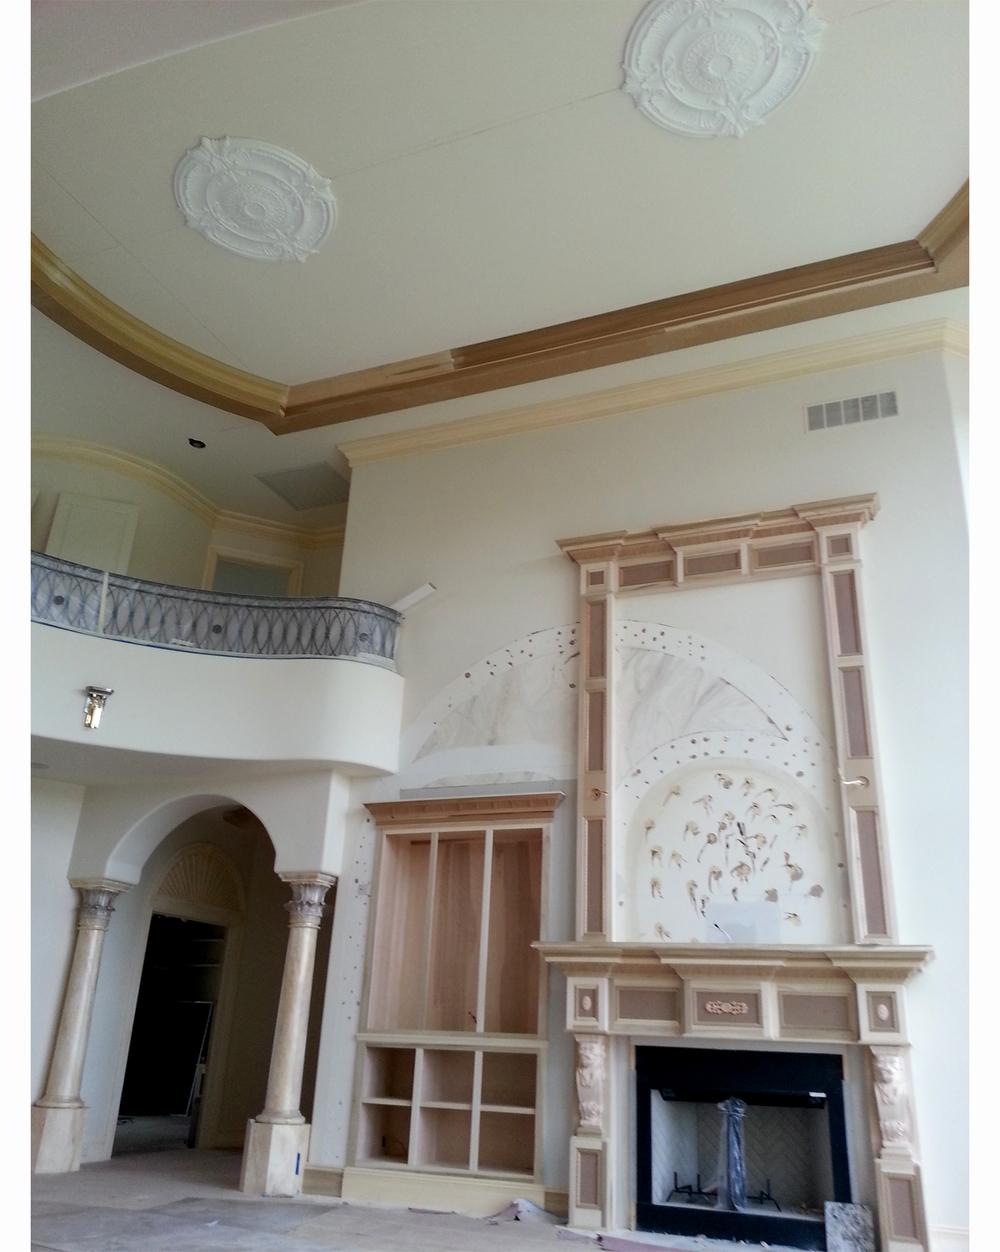 fireplace in progress edited frame.jpg